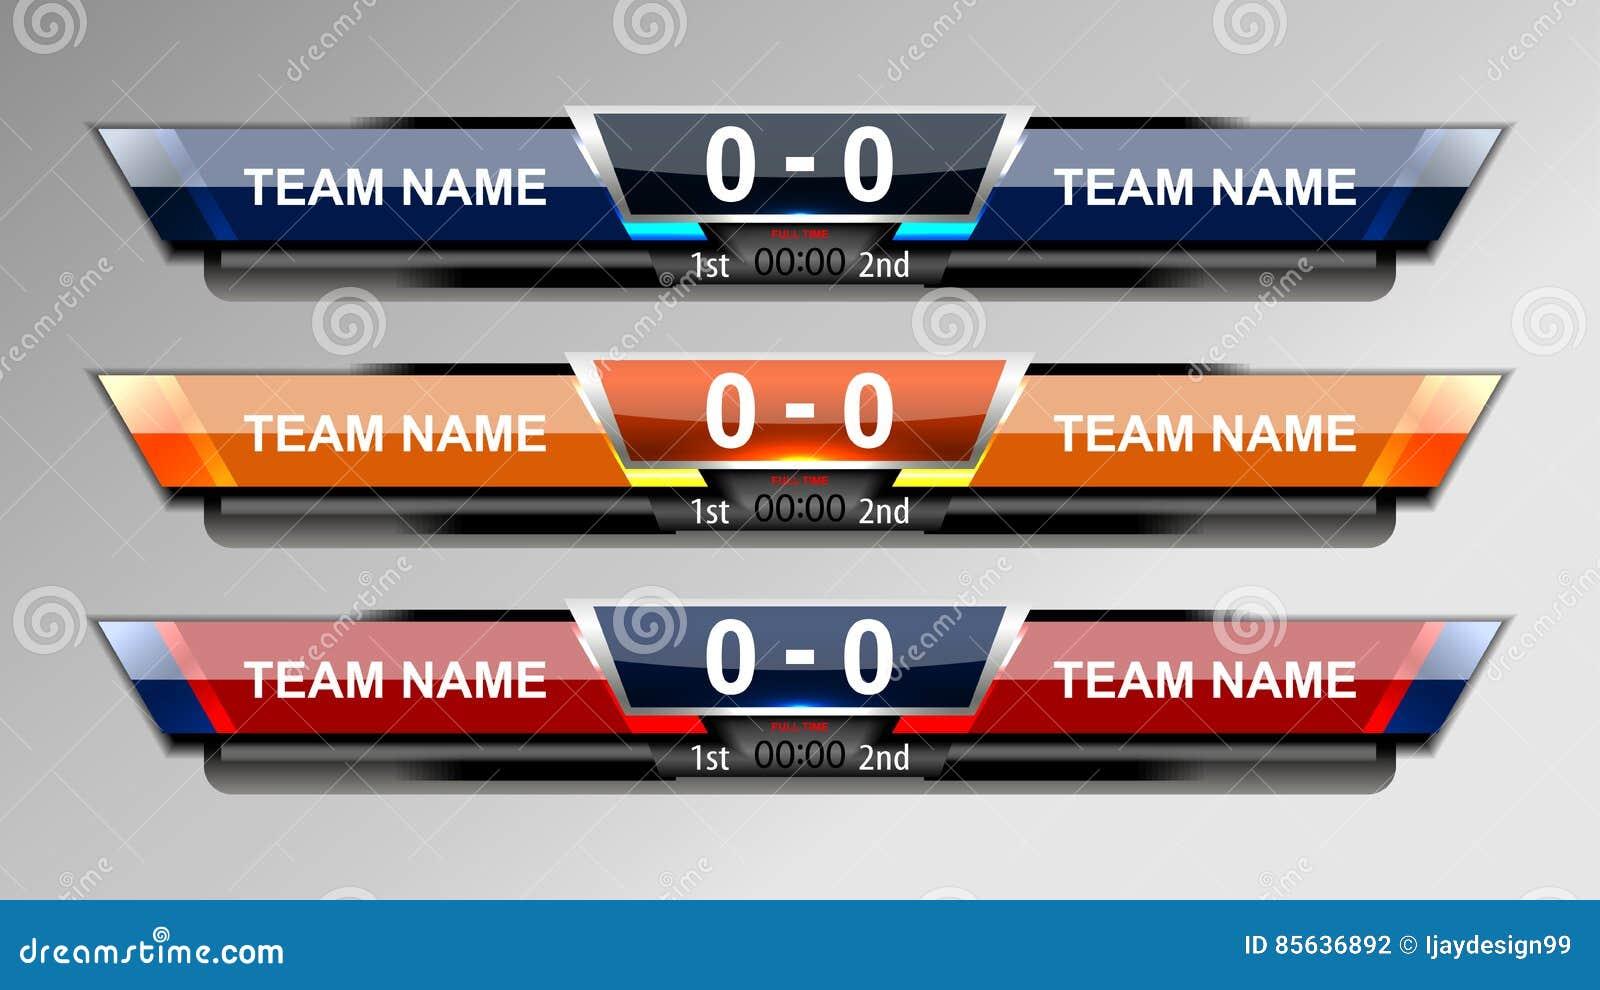 Soccer Score Broadcast Graphics